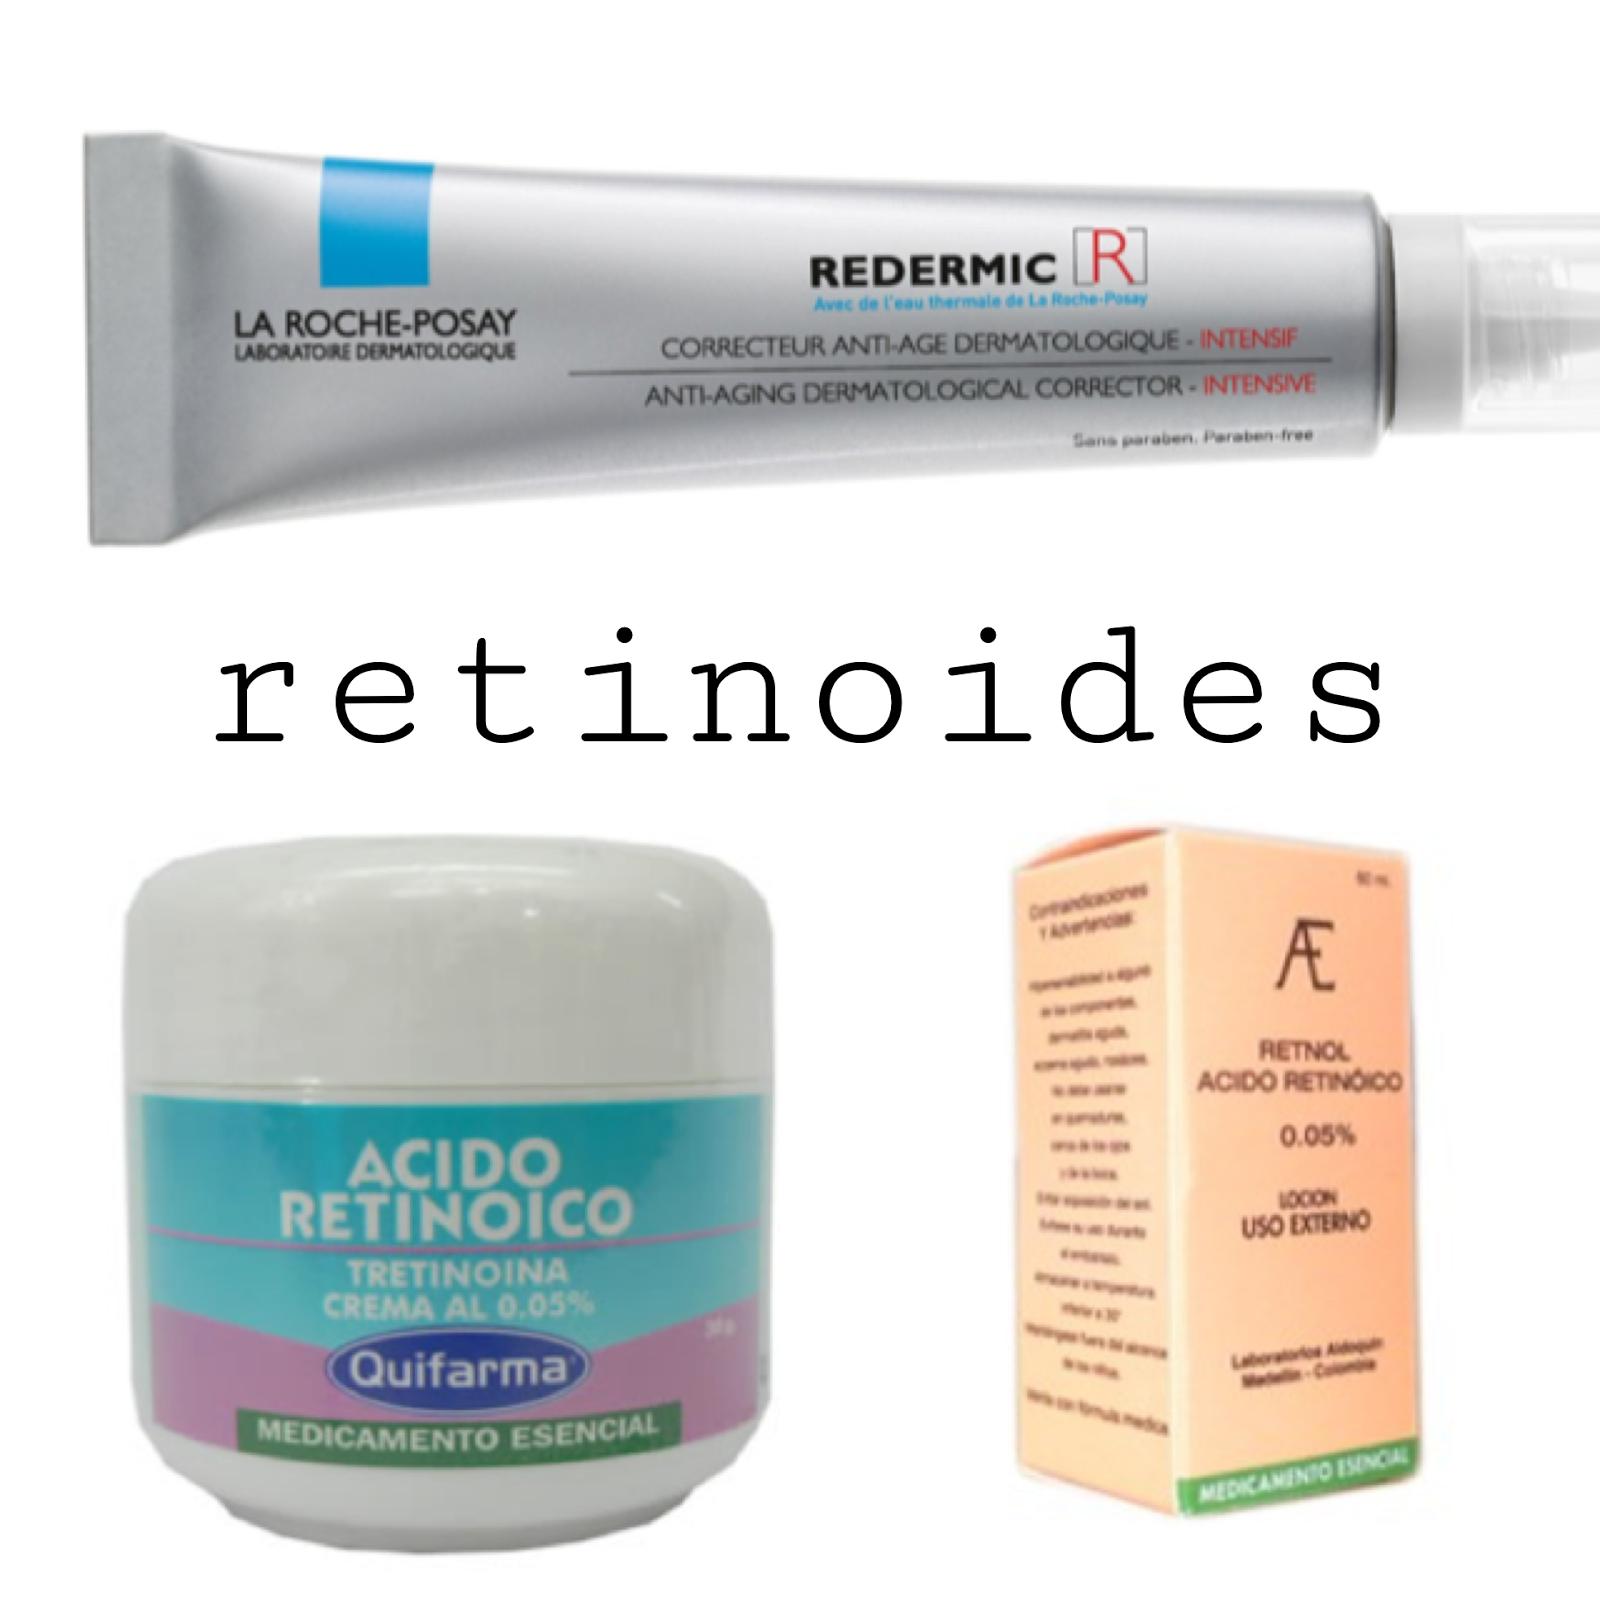 Para q sirve la crema de acido retinoico